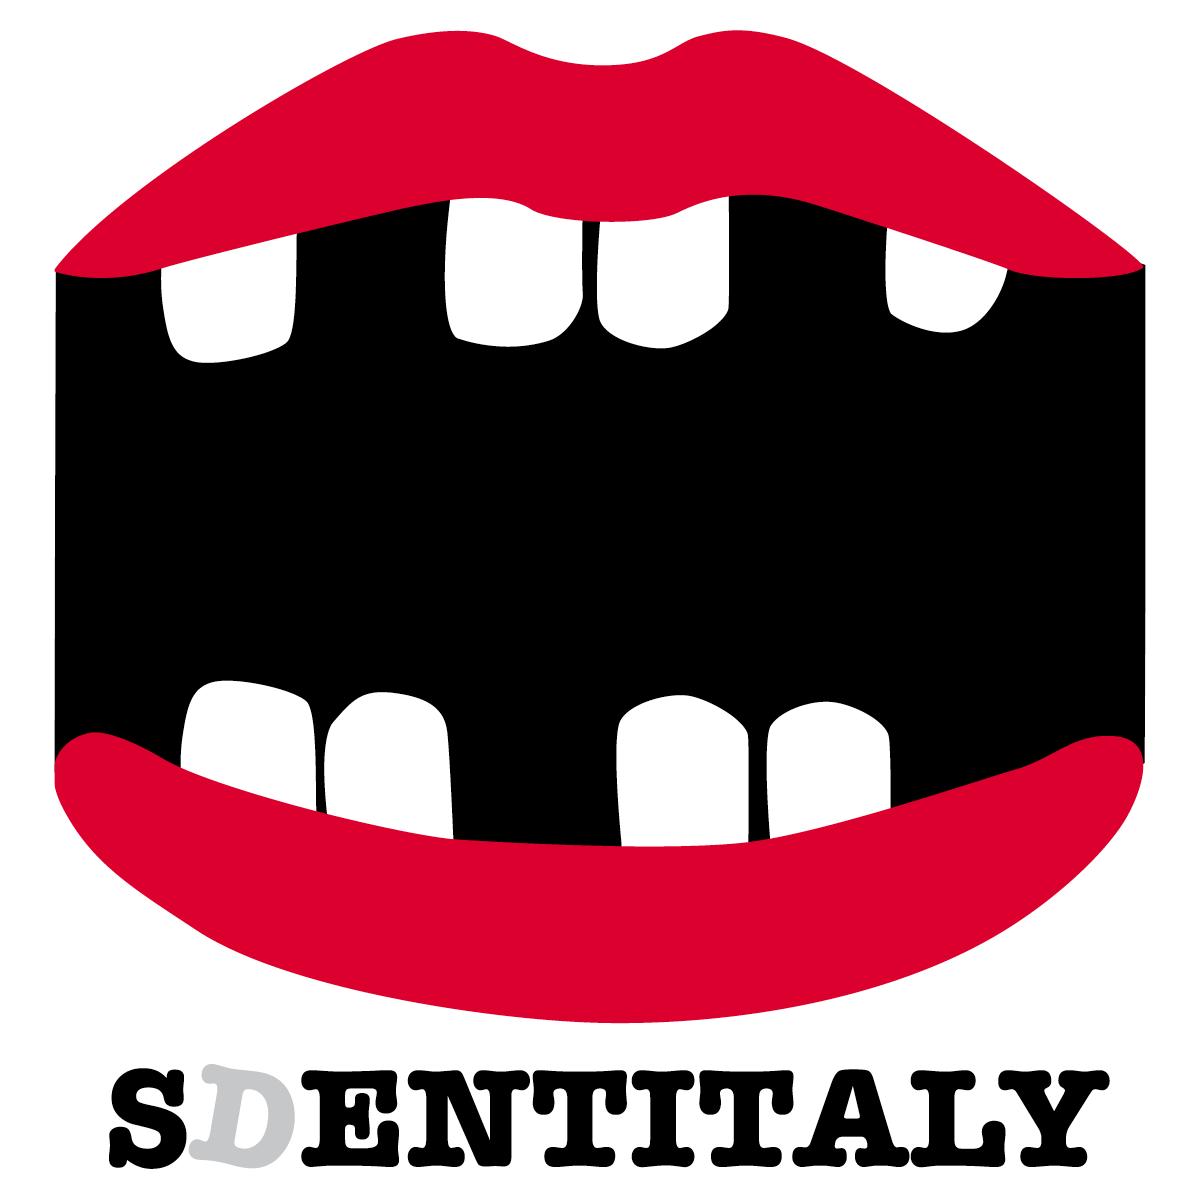 SDENTITALY